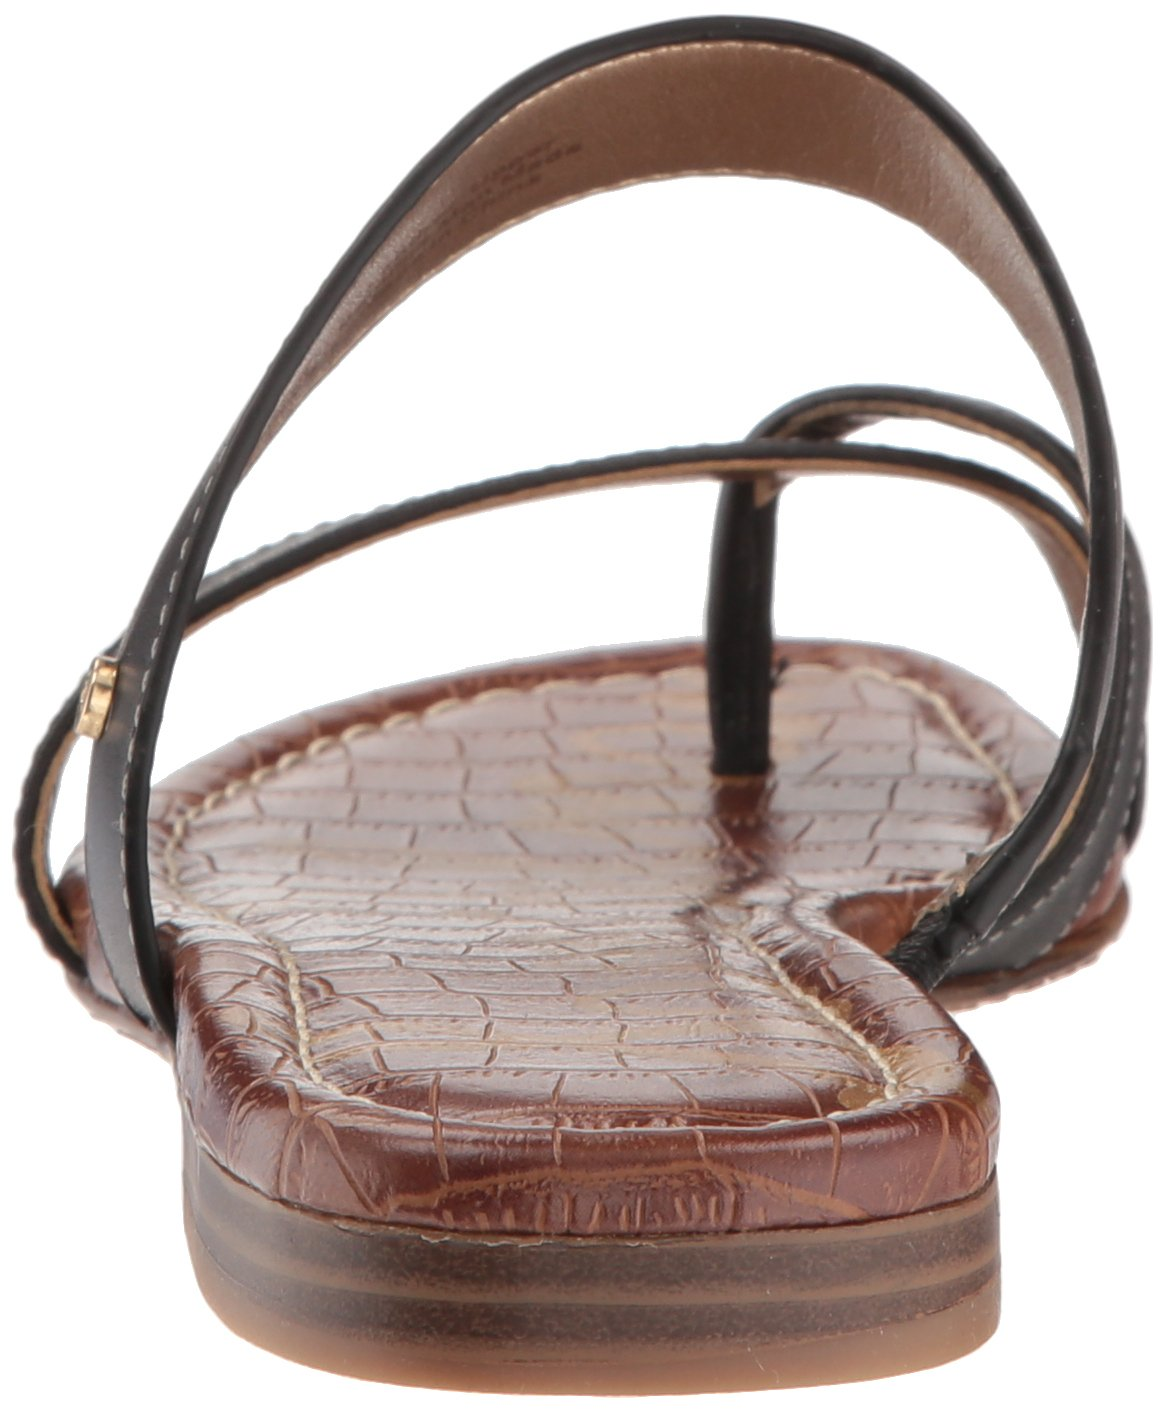 Sam Edelman Women's Bernice Slide Sandal B078HK525T 10 B(M) US|Black Leather